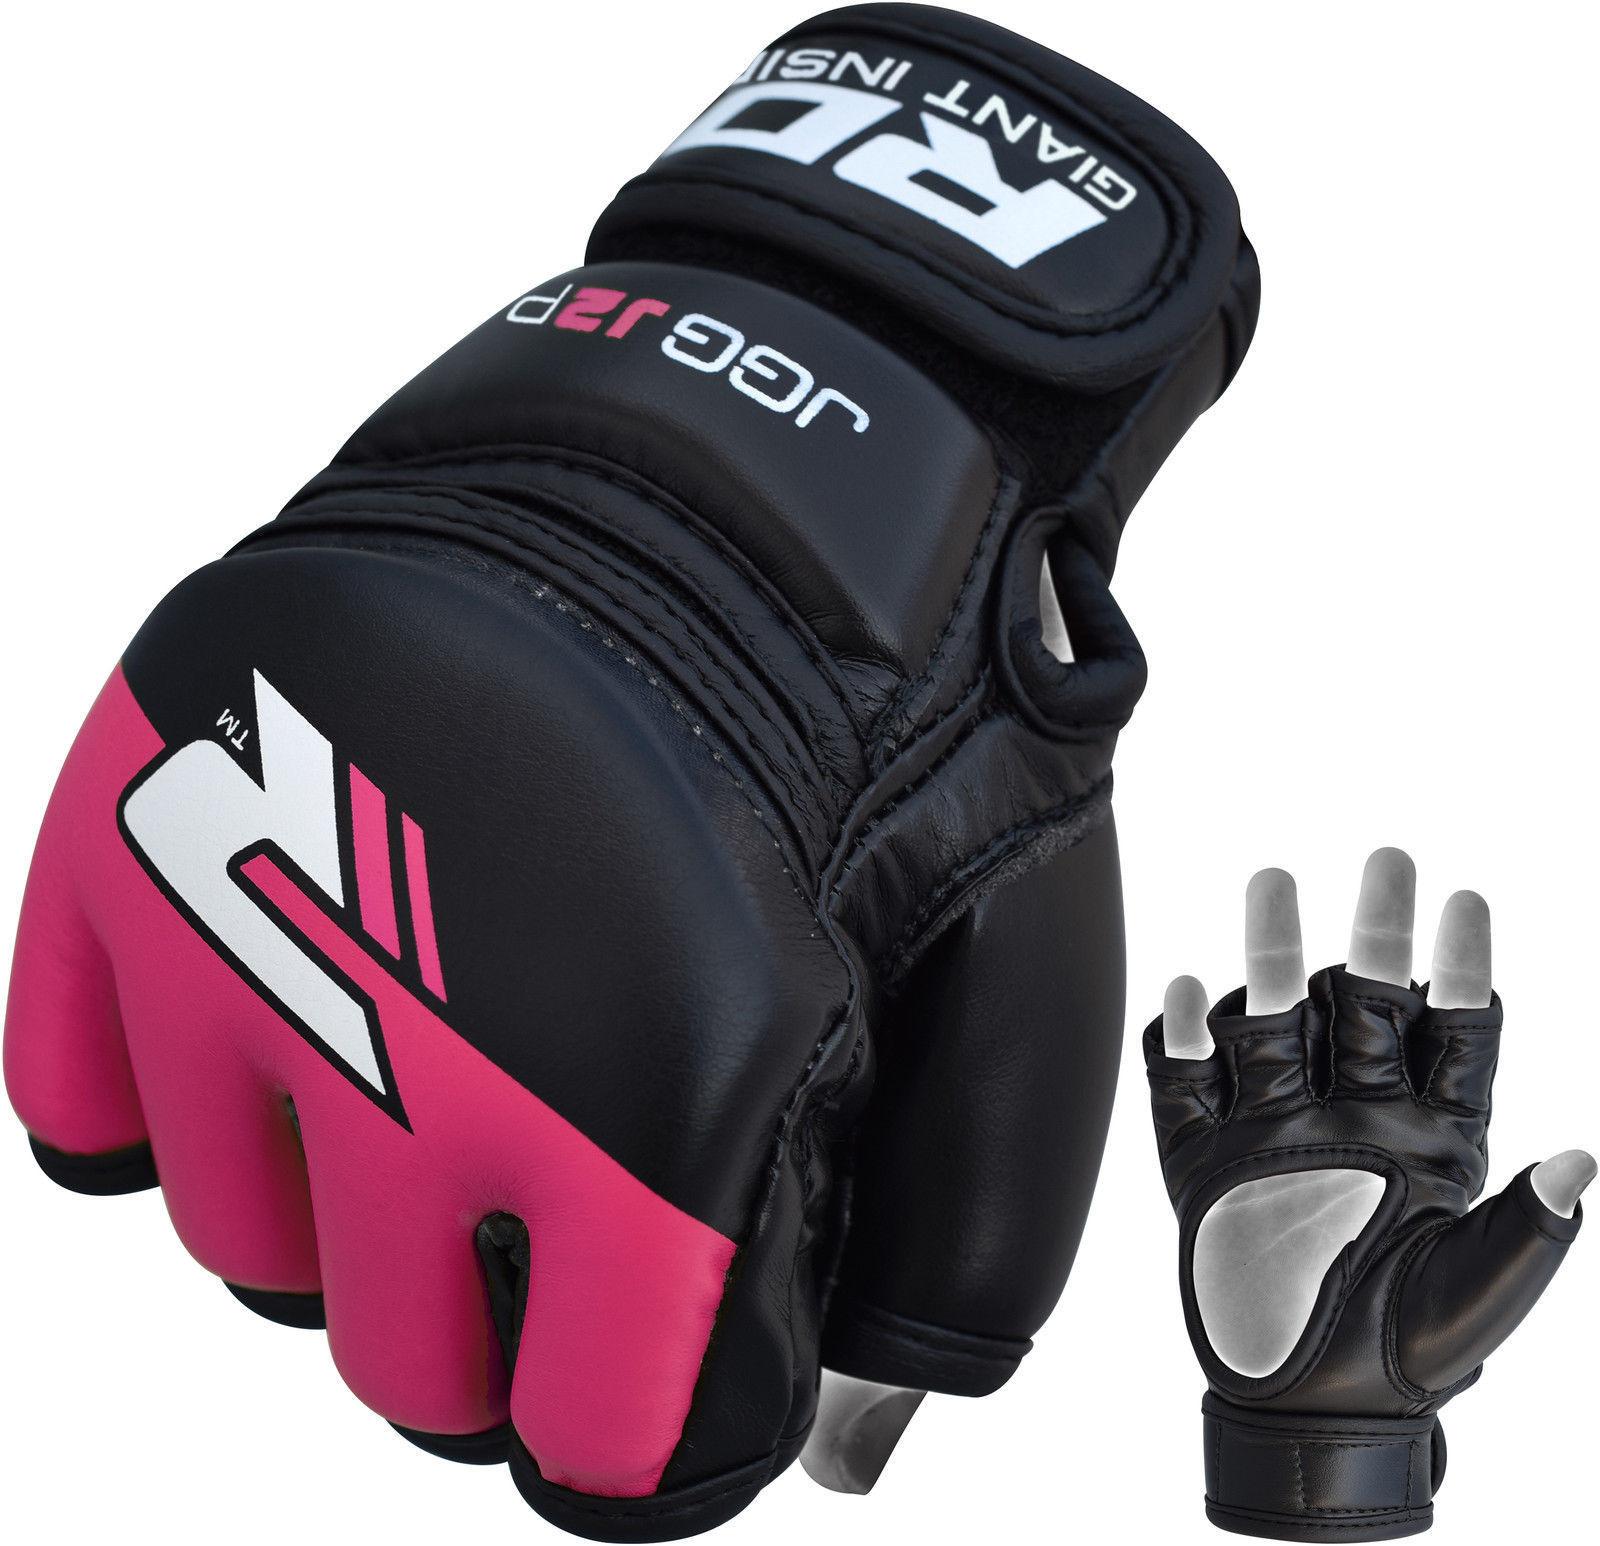 RDX Grappling Gloves Kids - Zwart met groen-538688